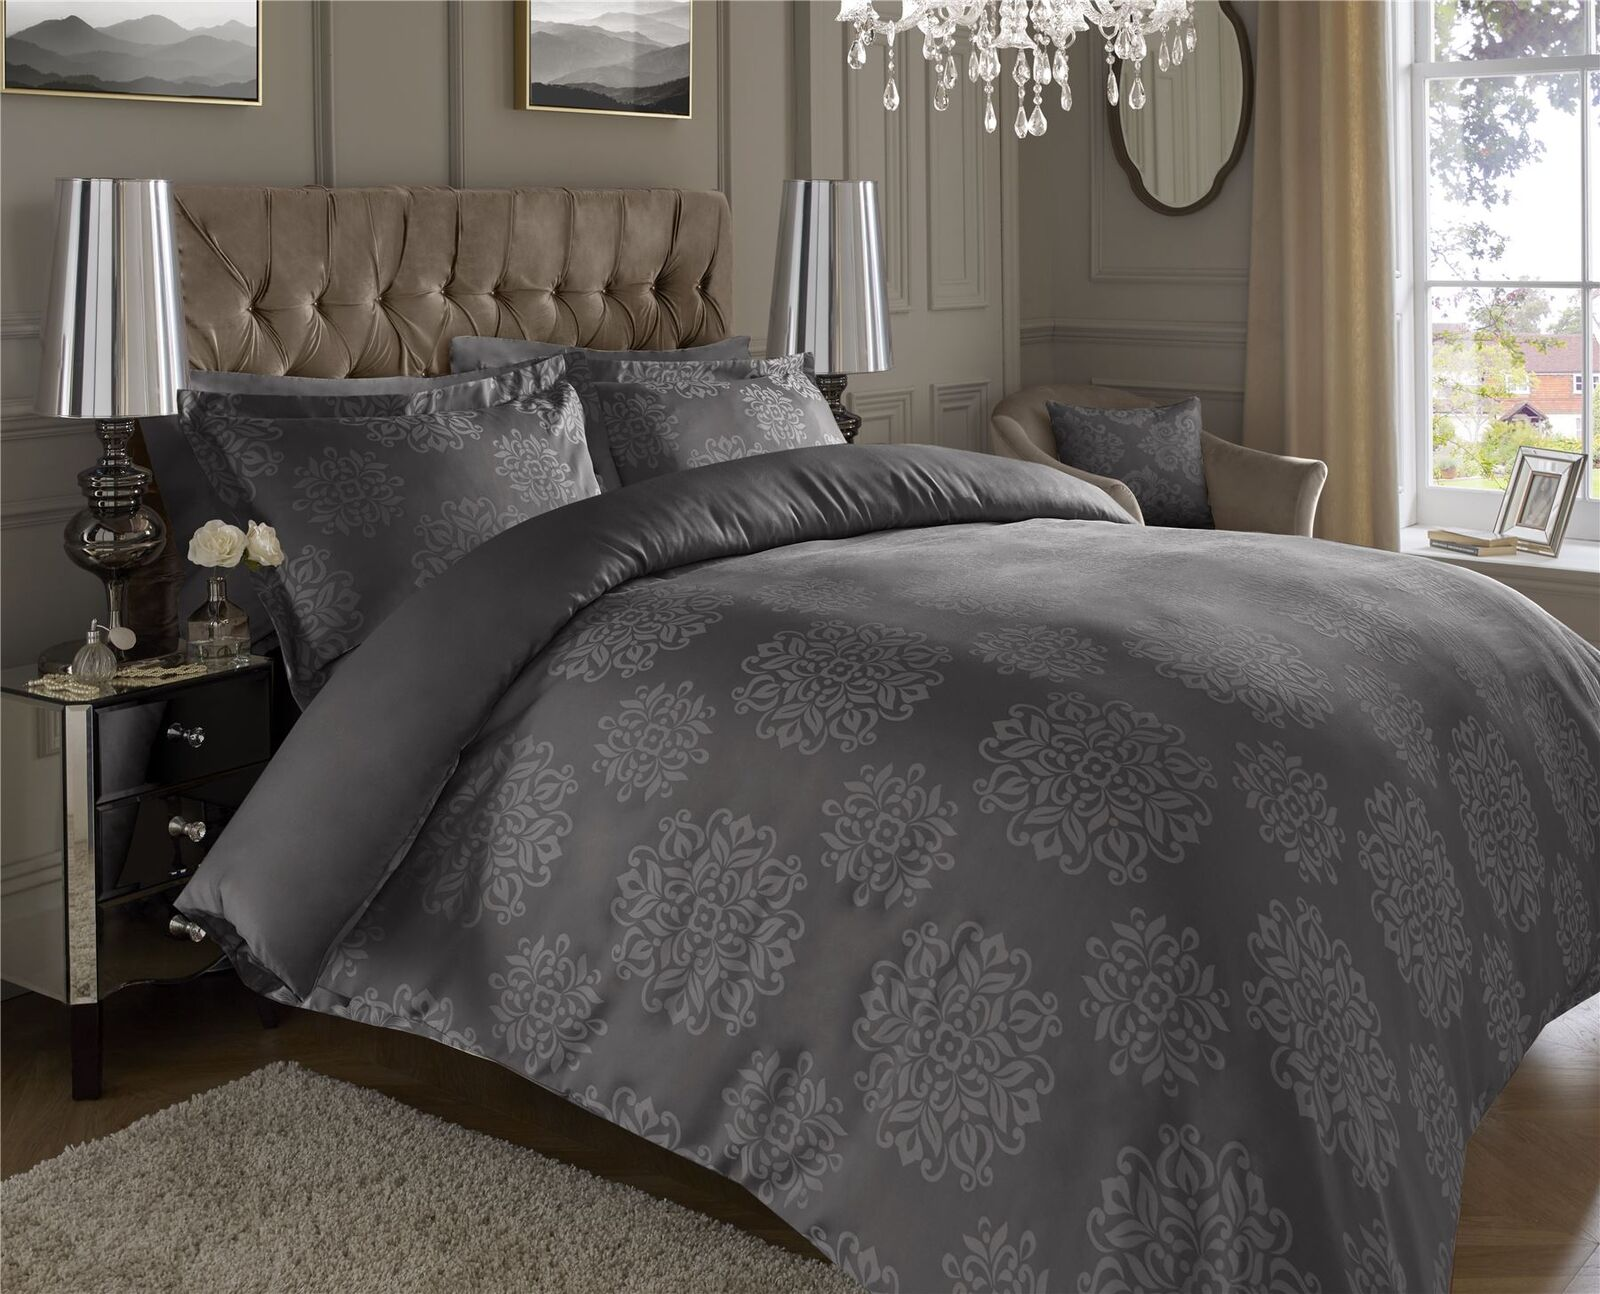 Luxury Trapunta 600TC Fili Cotone Jacquard Trapunta Luxury Copripiumone Federe per Cuscini Set 9dcbdf